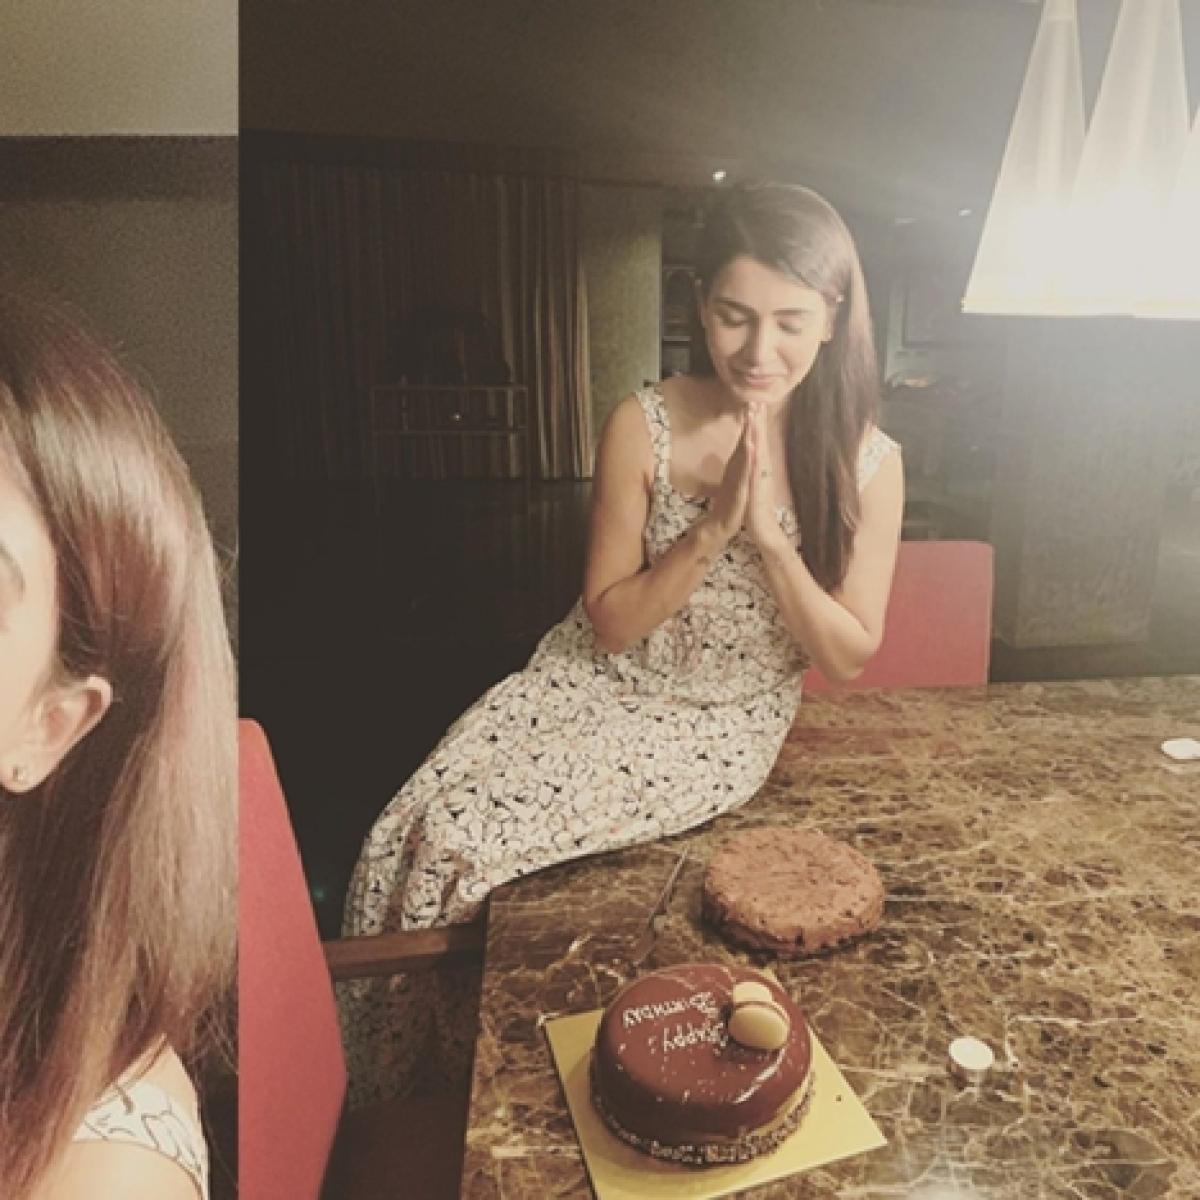 Naga Chaitanya bakes chocolate cake from scratch on Samantha Akkineni's birthday